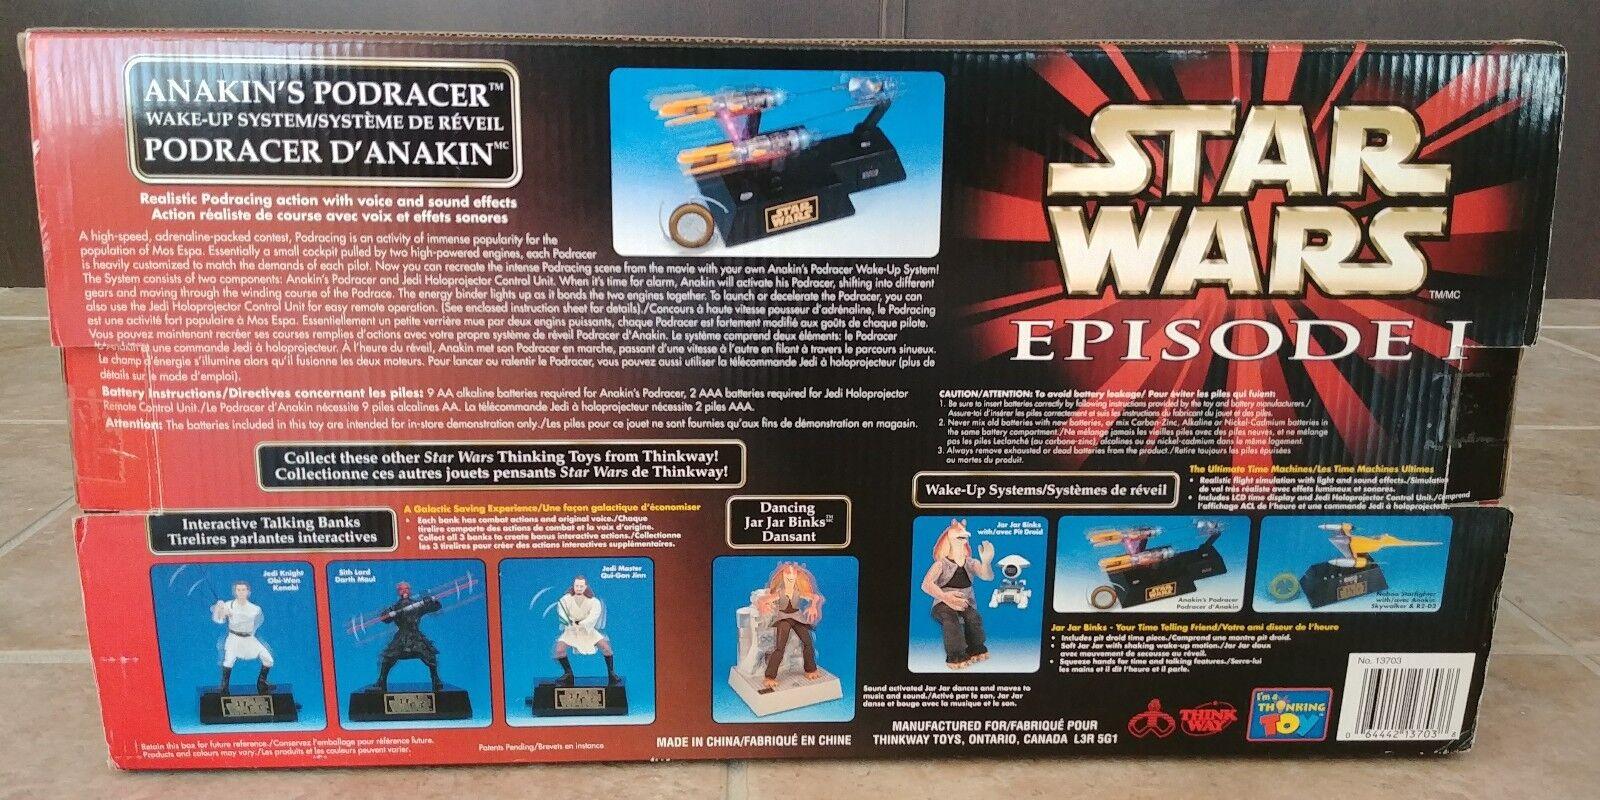 Star Wars Episode I Anakin's Podracer Wake-Up Wake-Up Wake-Up System f73211